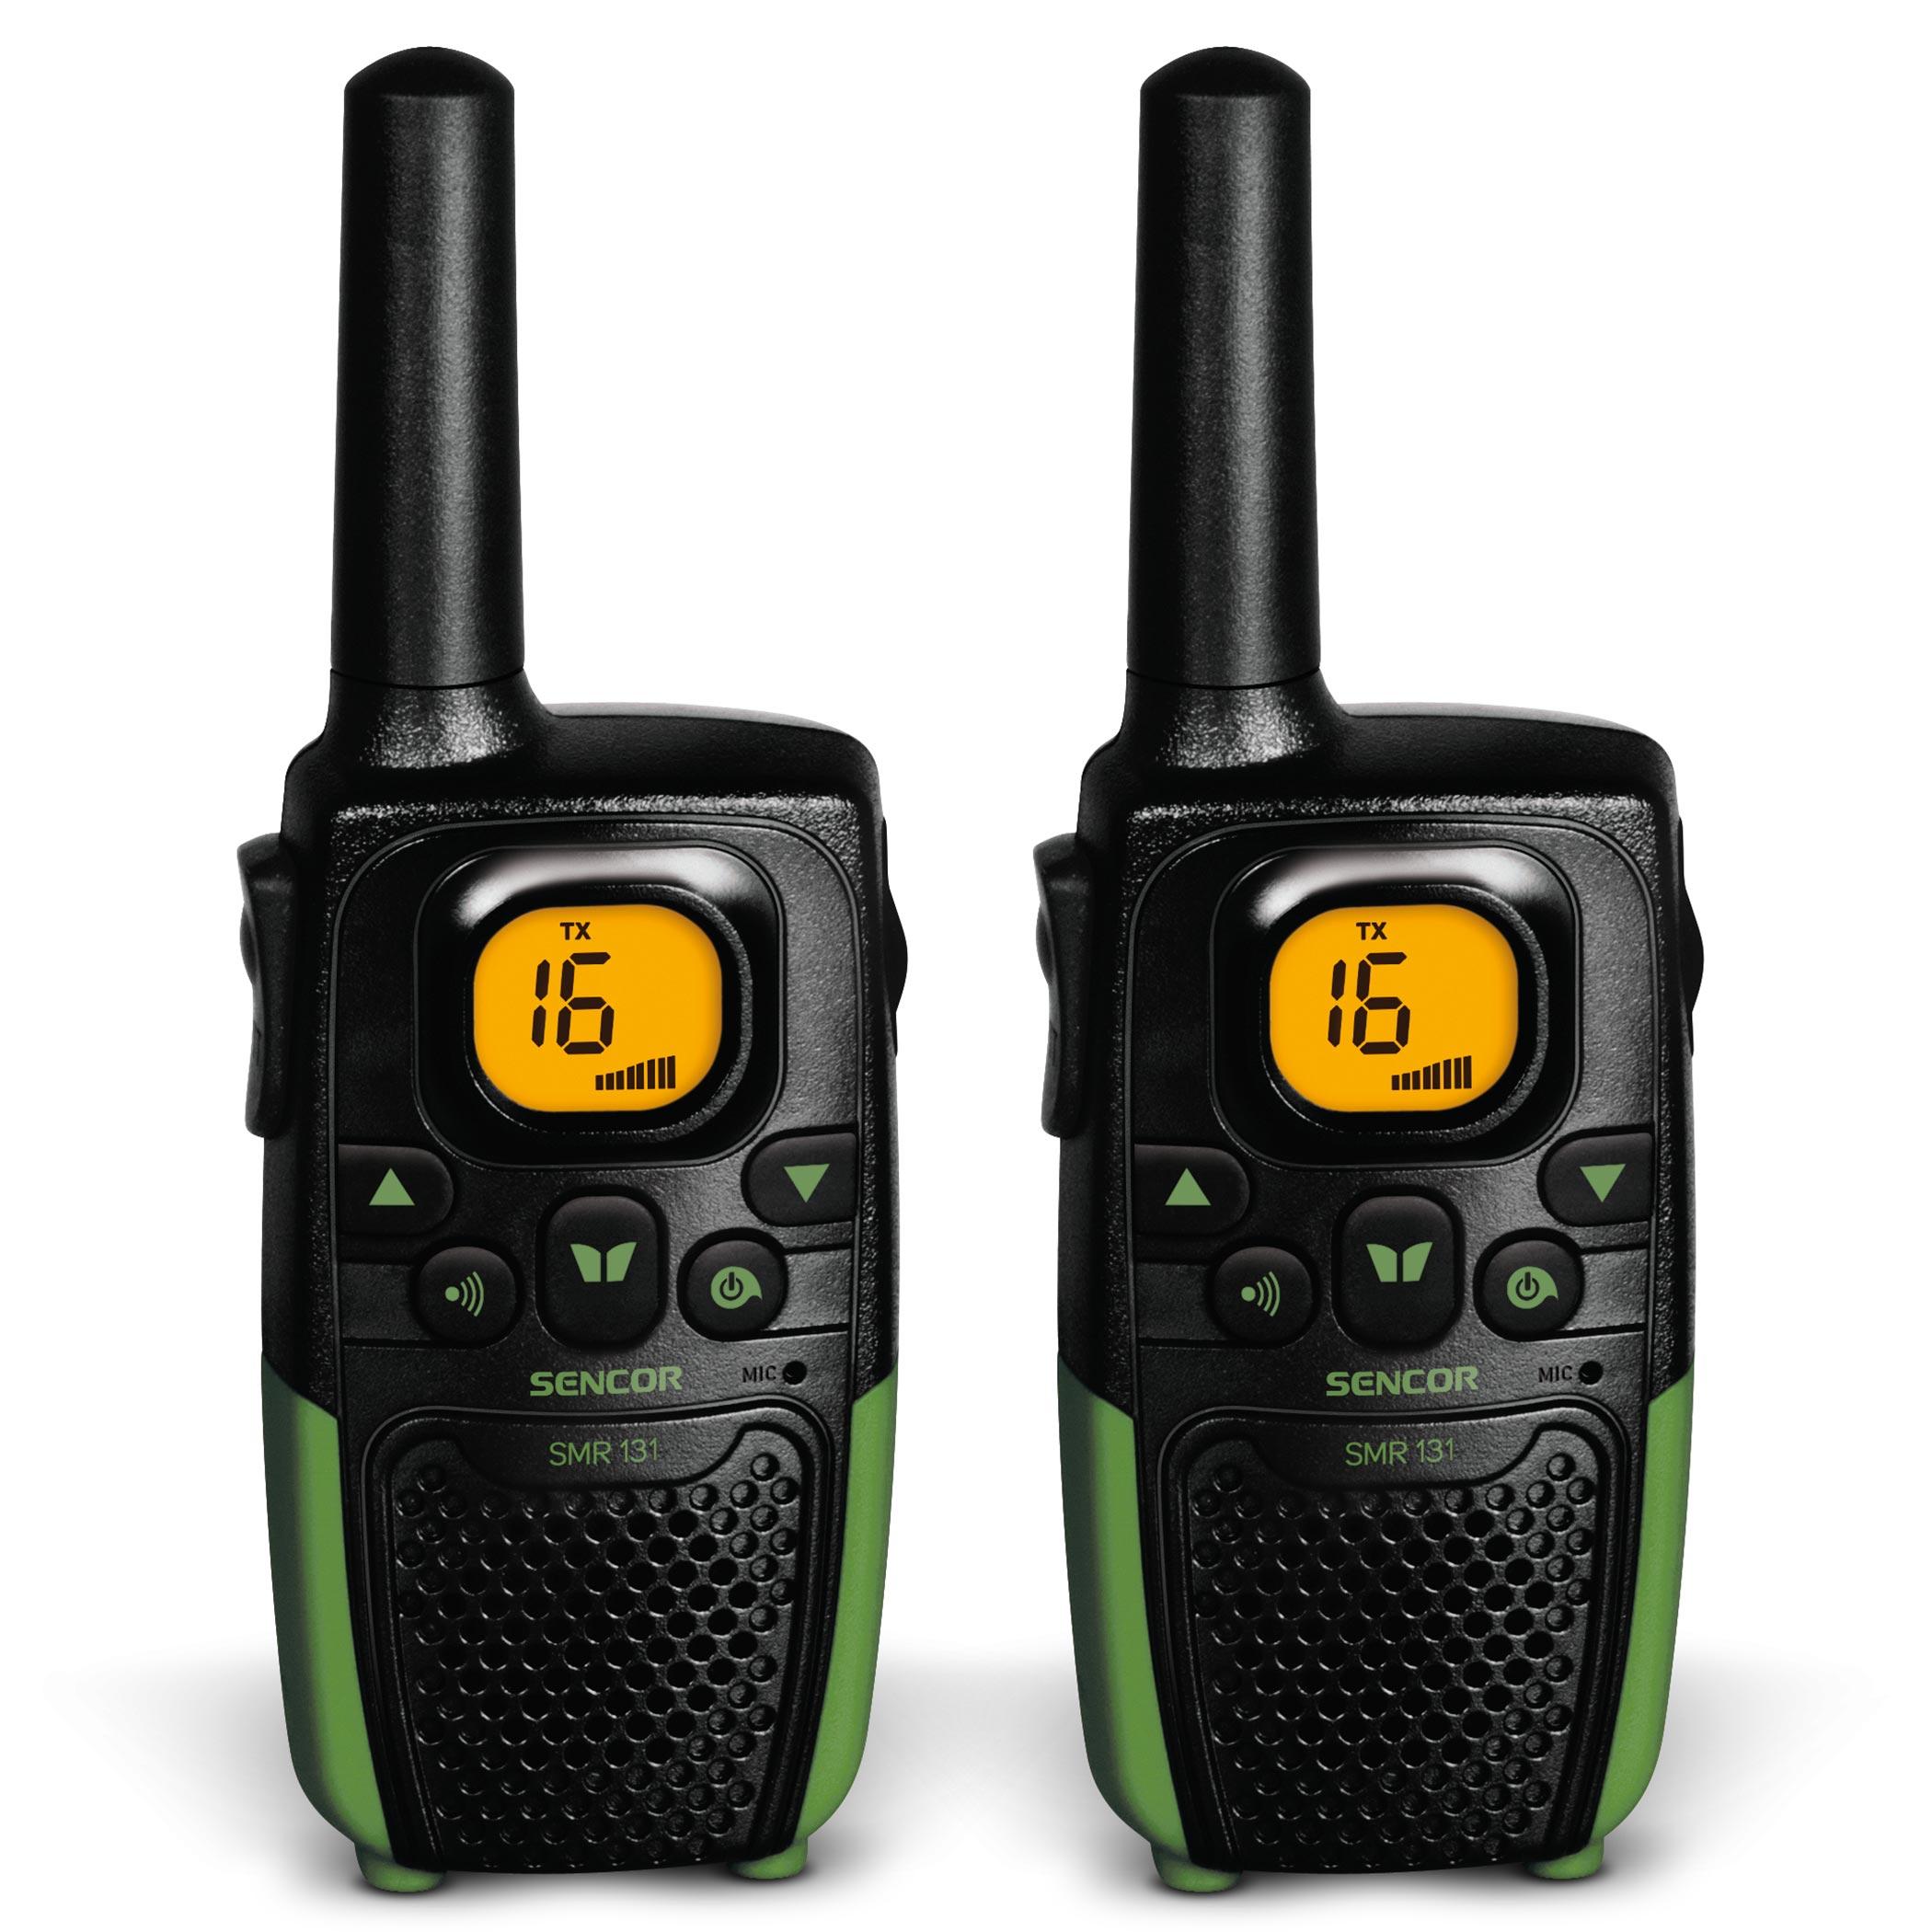 Sencor SMR131 walkie talkie